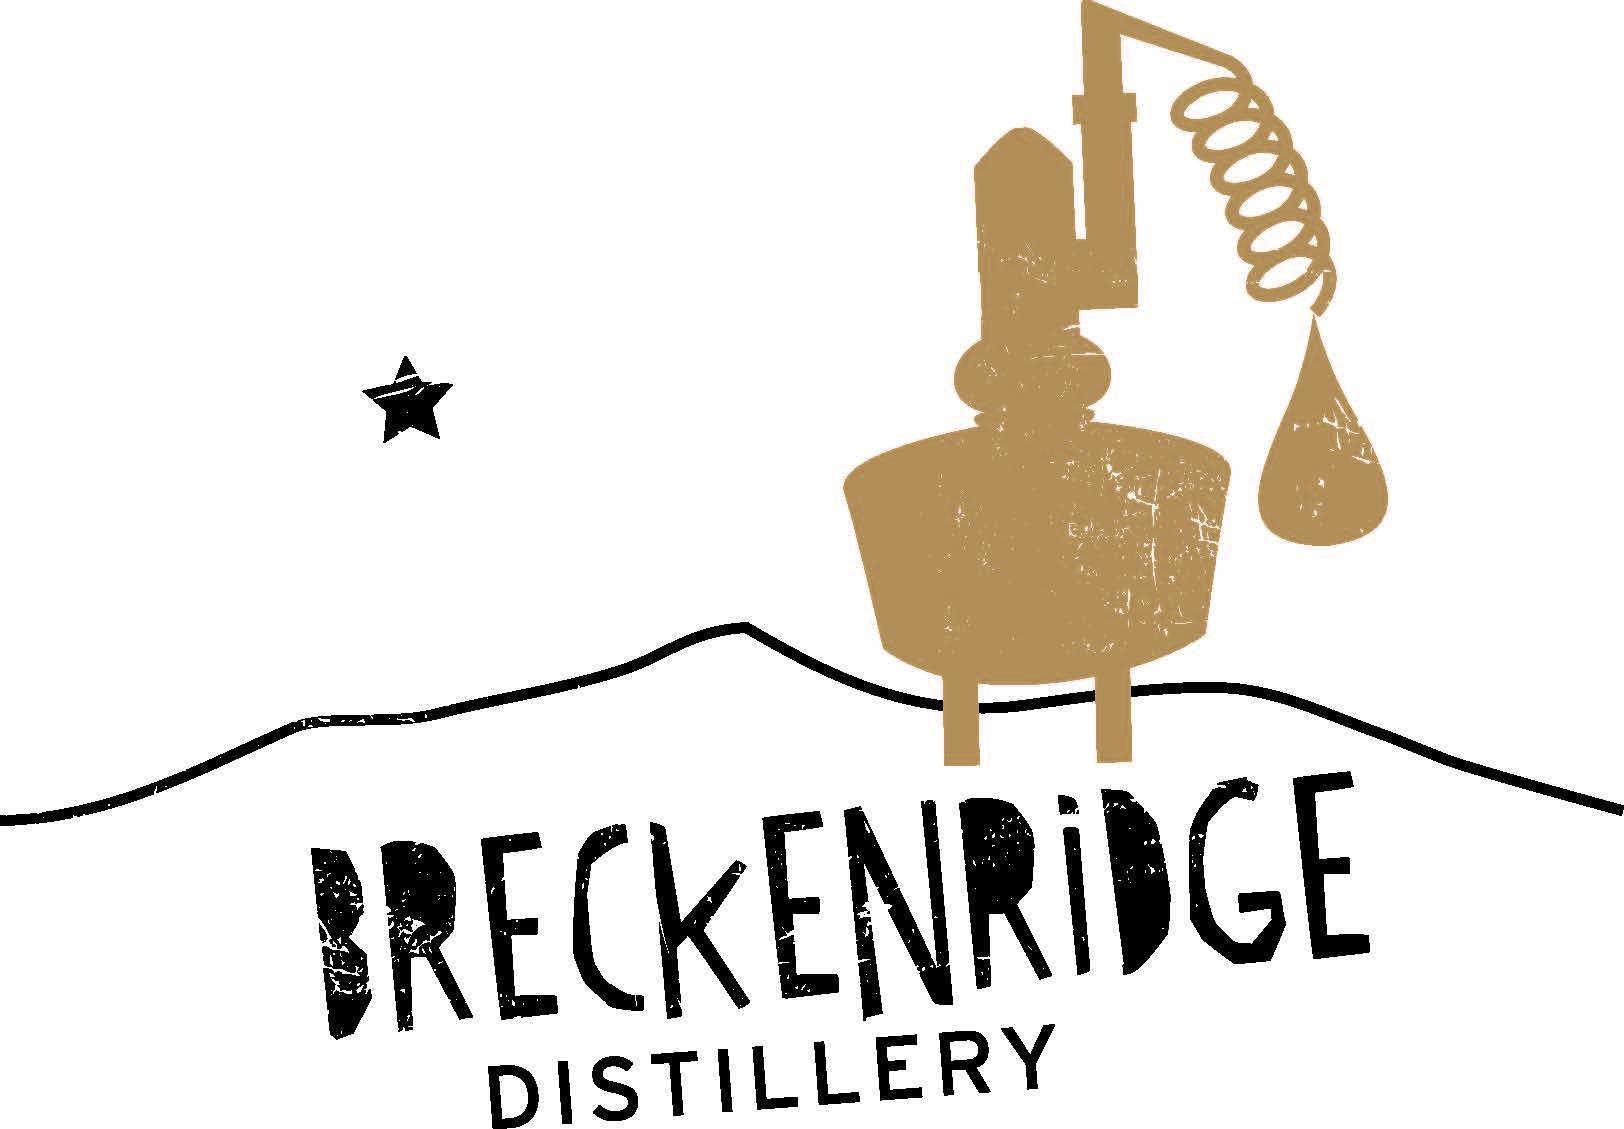 breckenridge-distillery